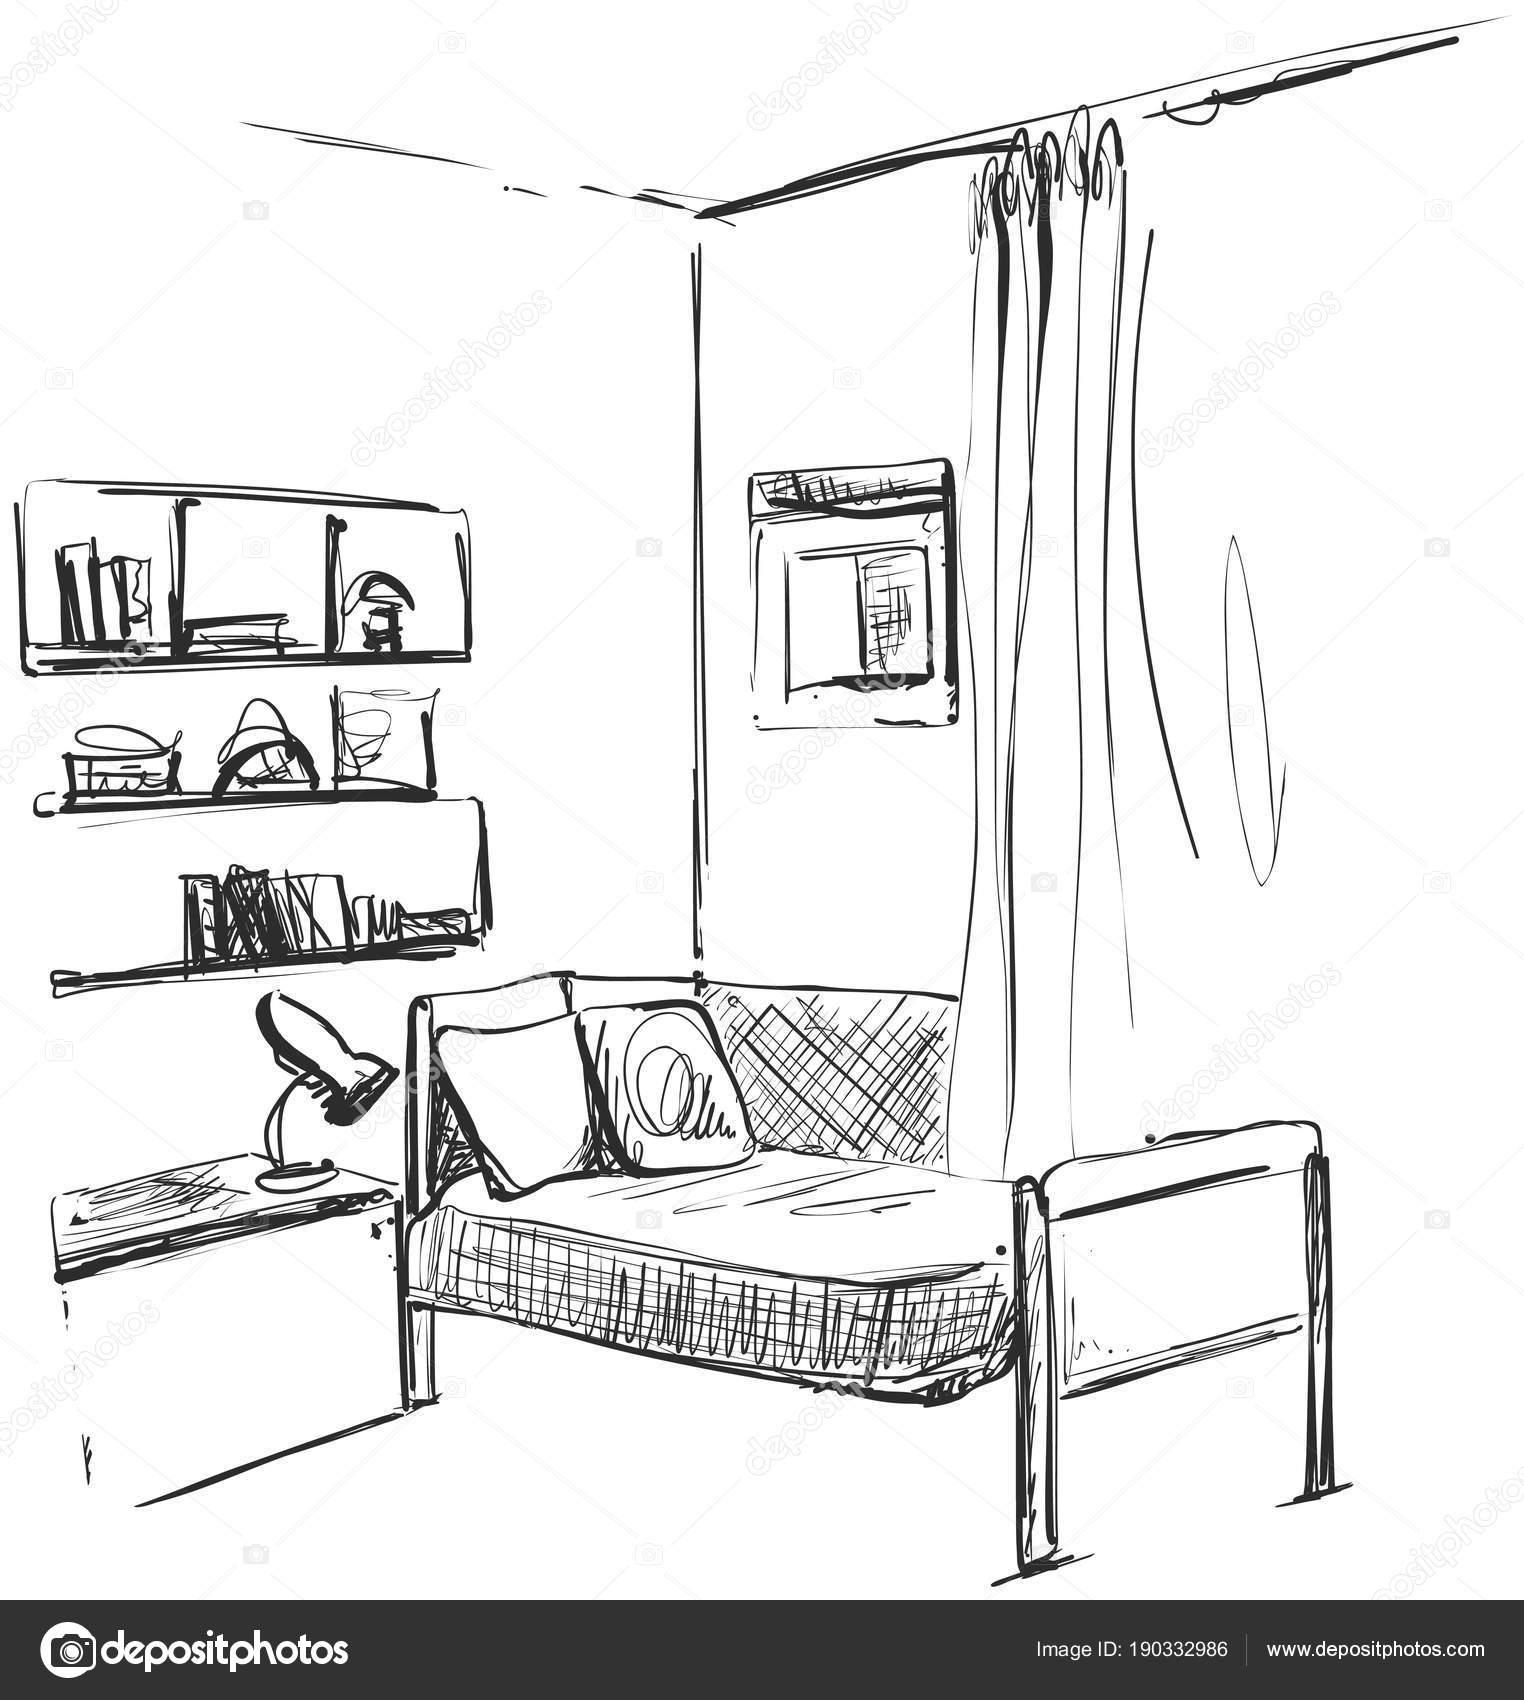 Dessin D Une Chambre D Enfant children room.graphic black white interior sketch vector